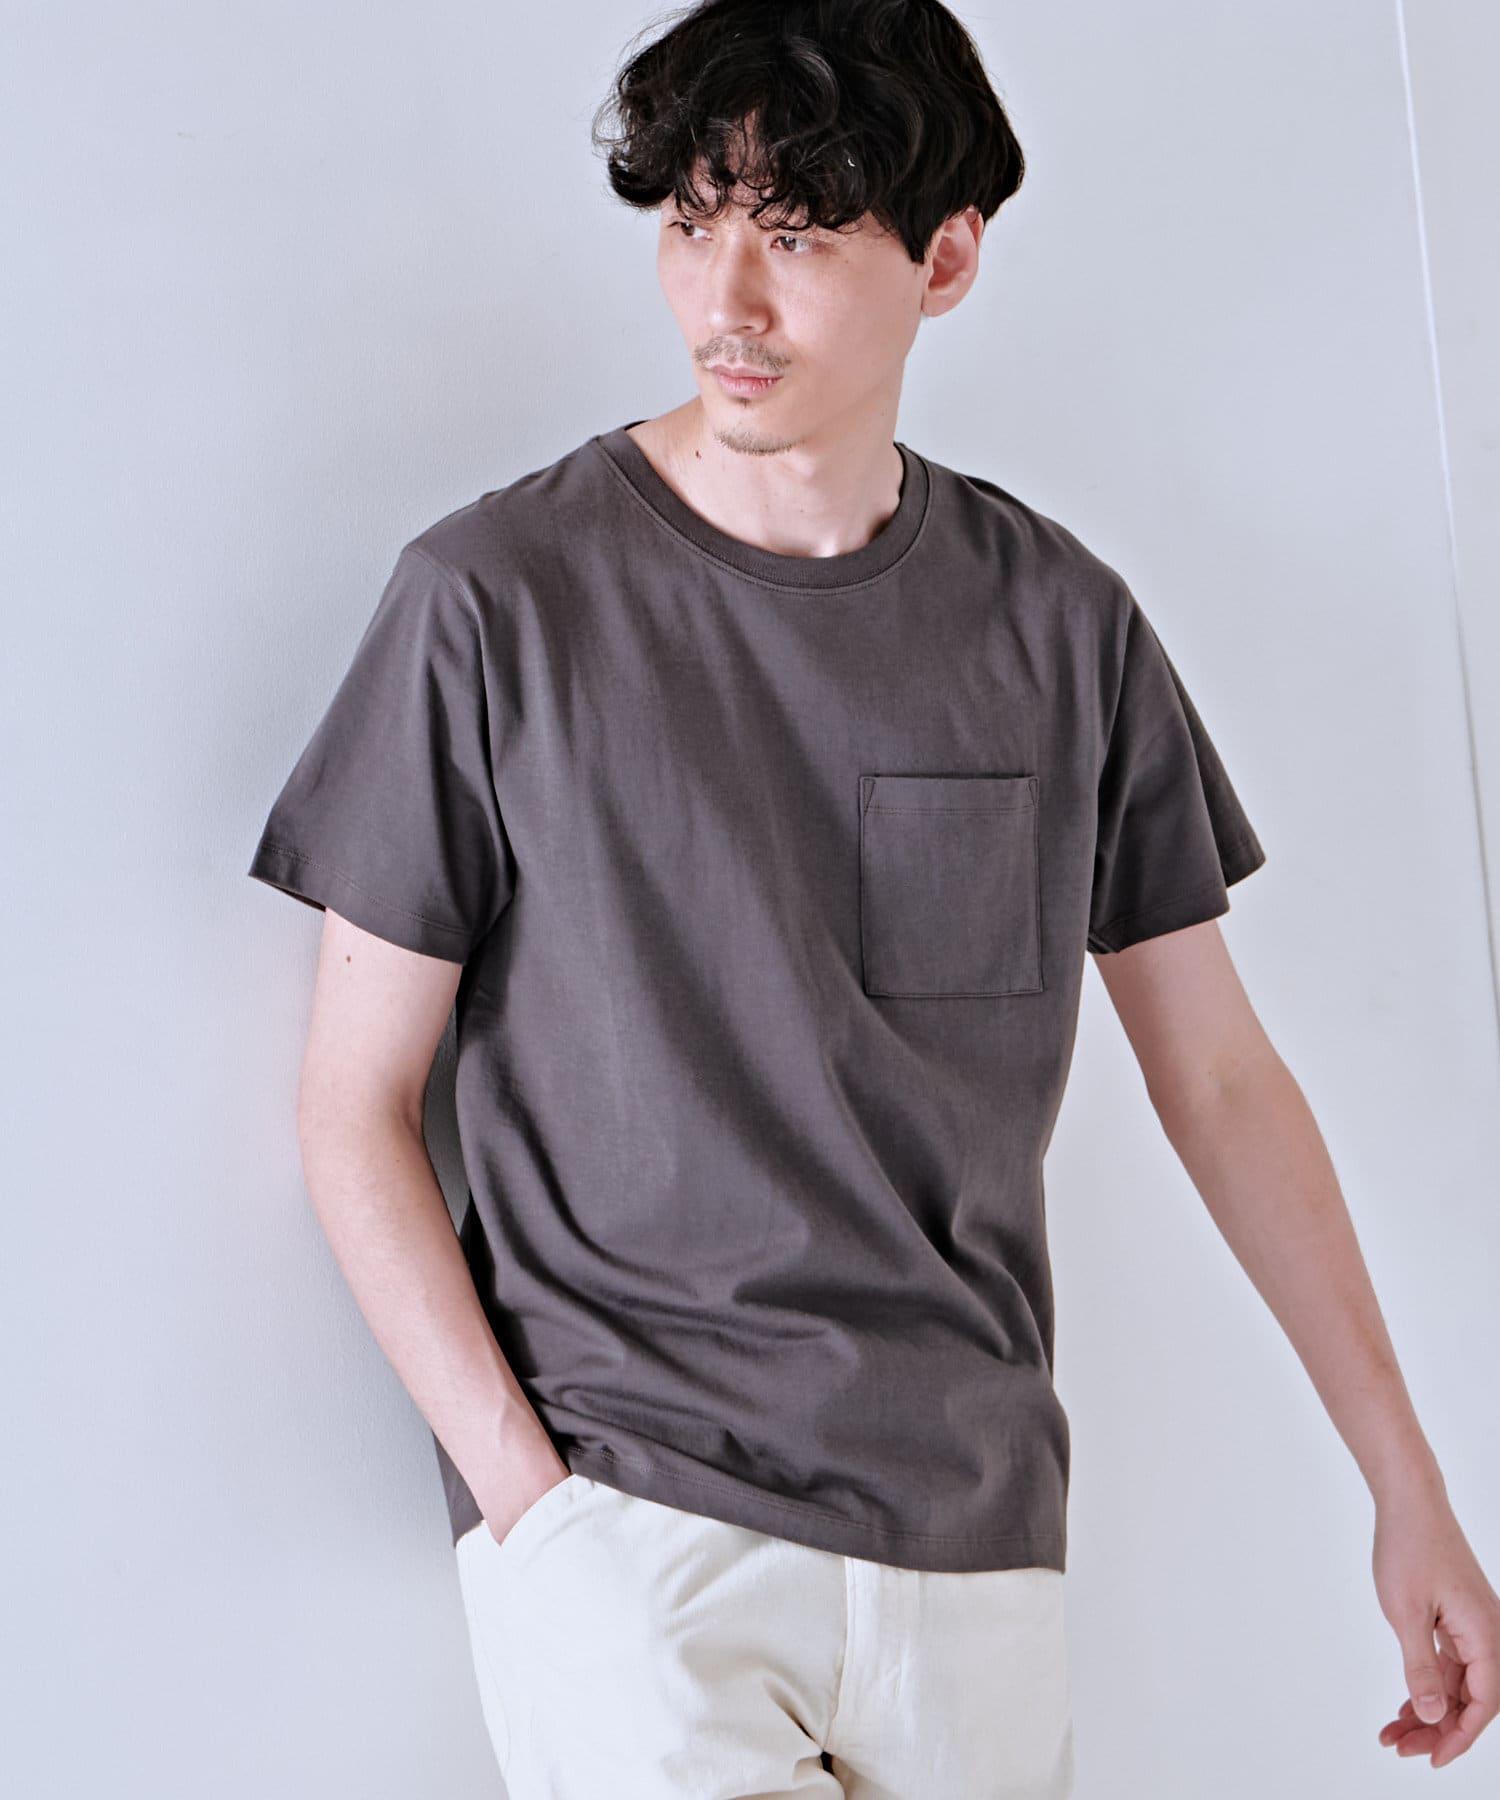 Discoat(ディスコート) メンズ USコットン胸ポケTシャツ トープ